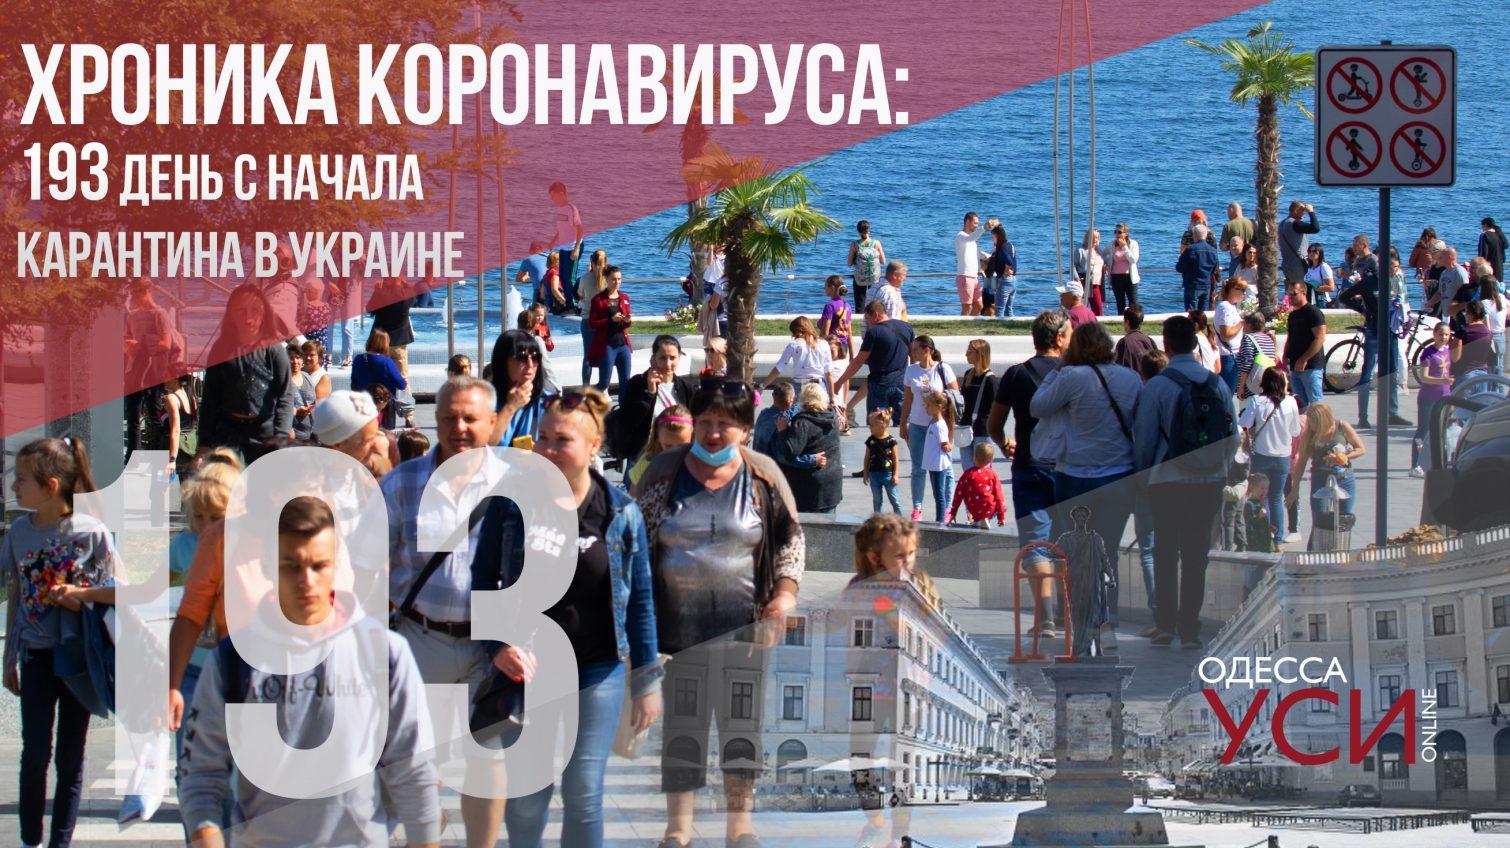 Хроника коронавируса: 193 день с начала карантина в Украине «фото»